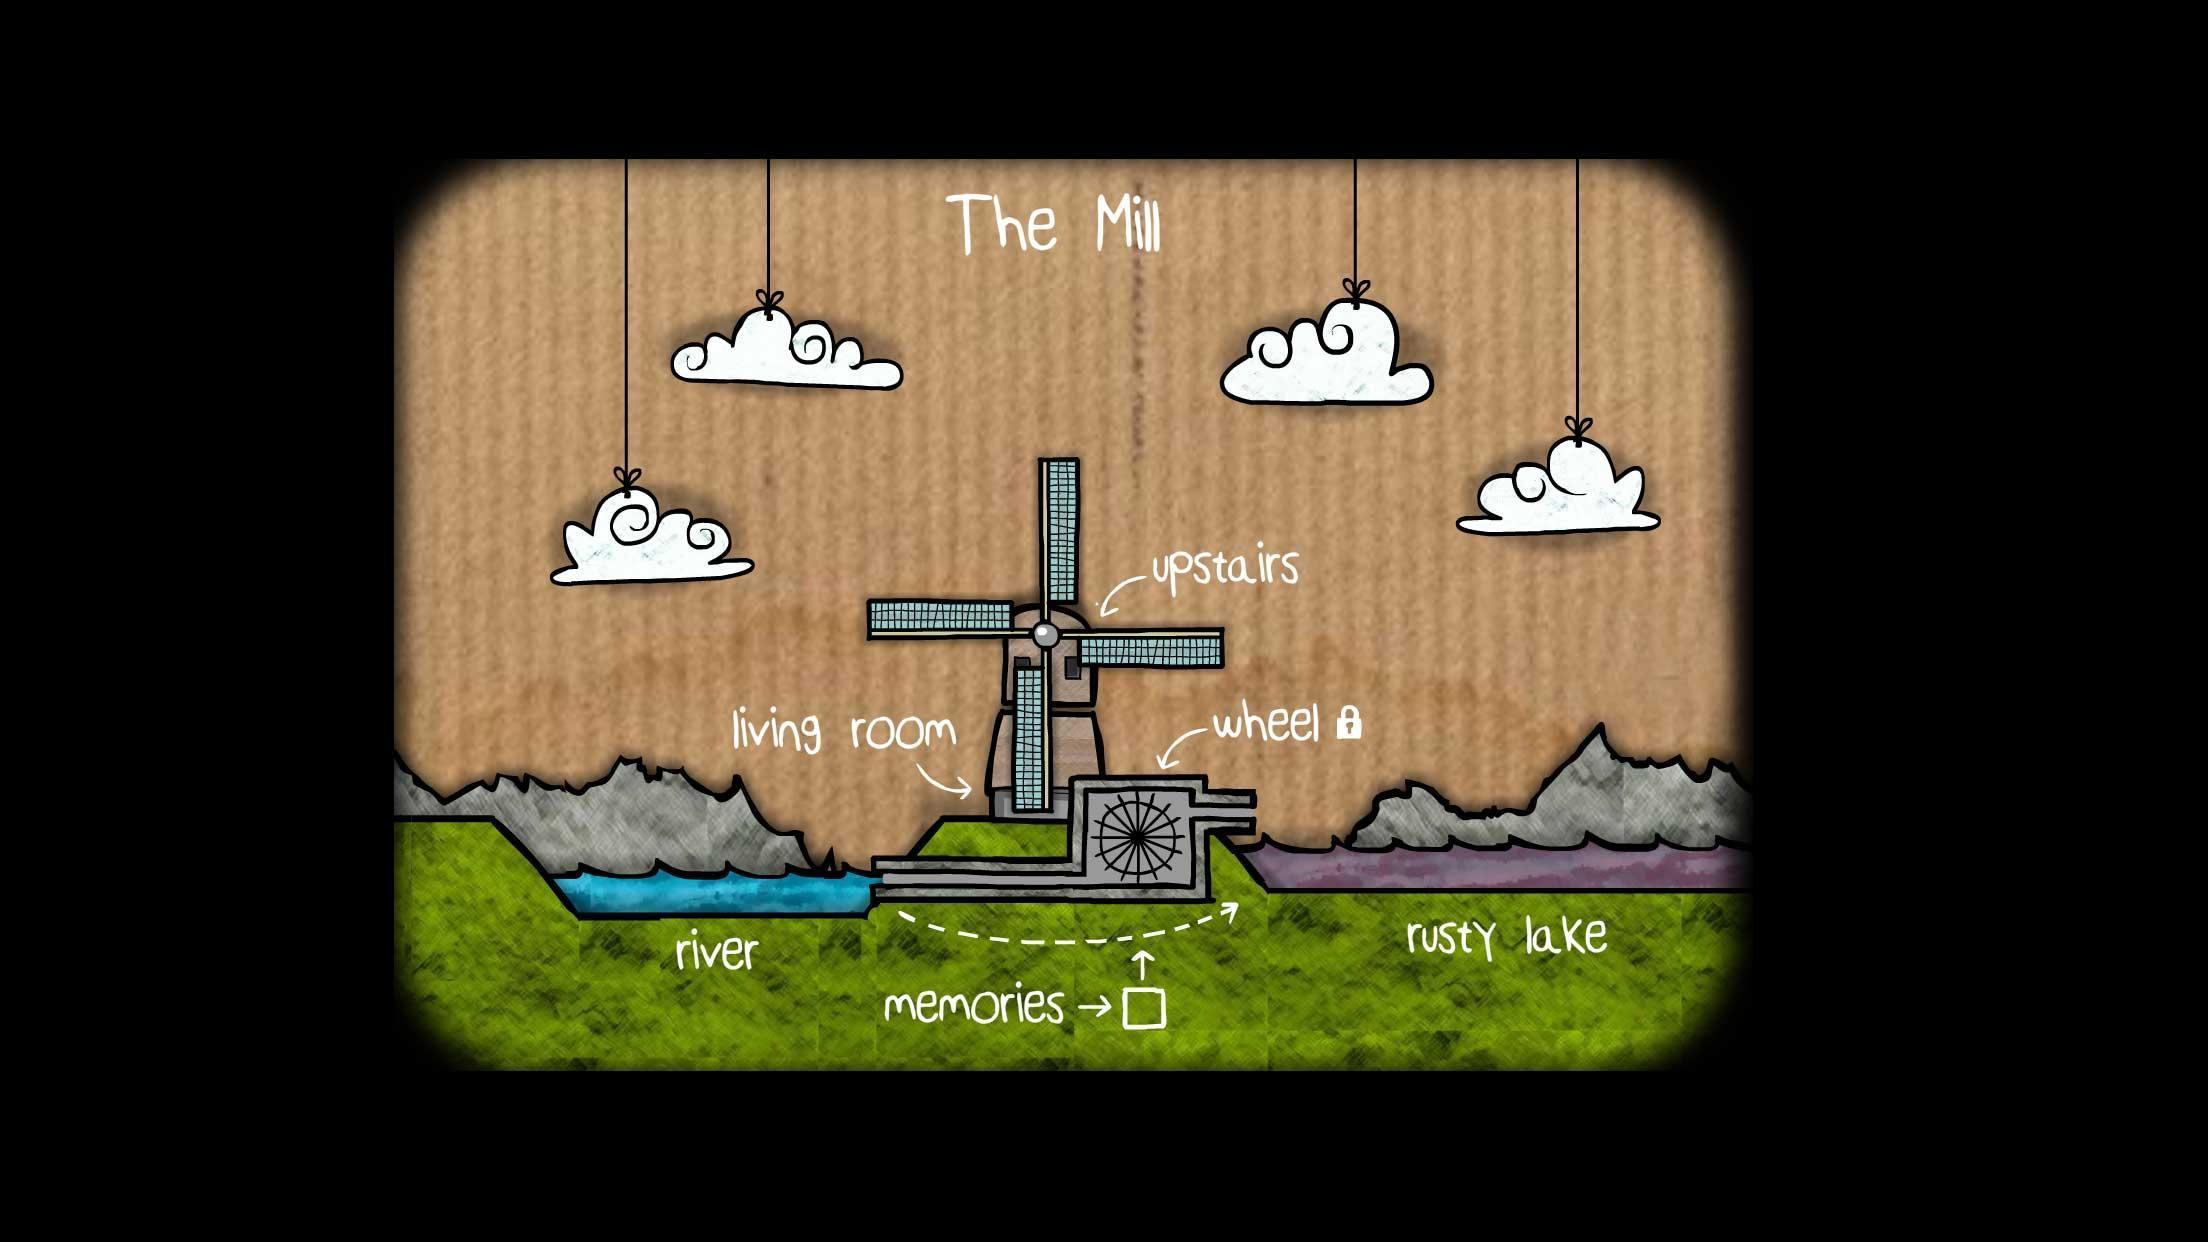 Cube Escape: The Mill 3.1.1 Screenshot 6